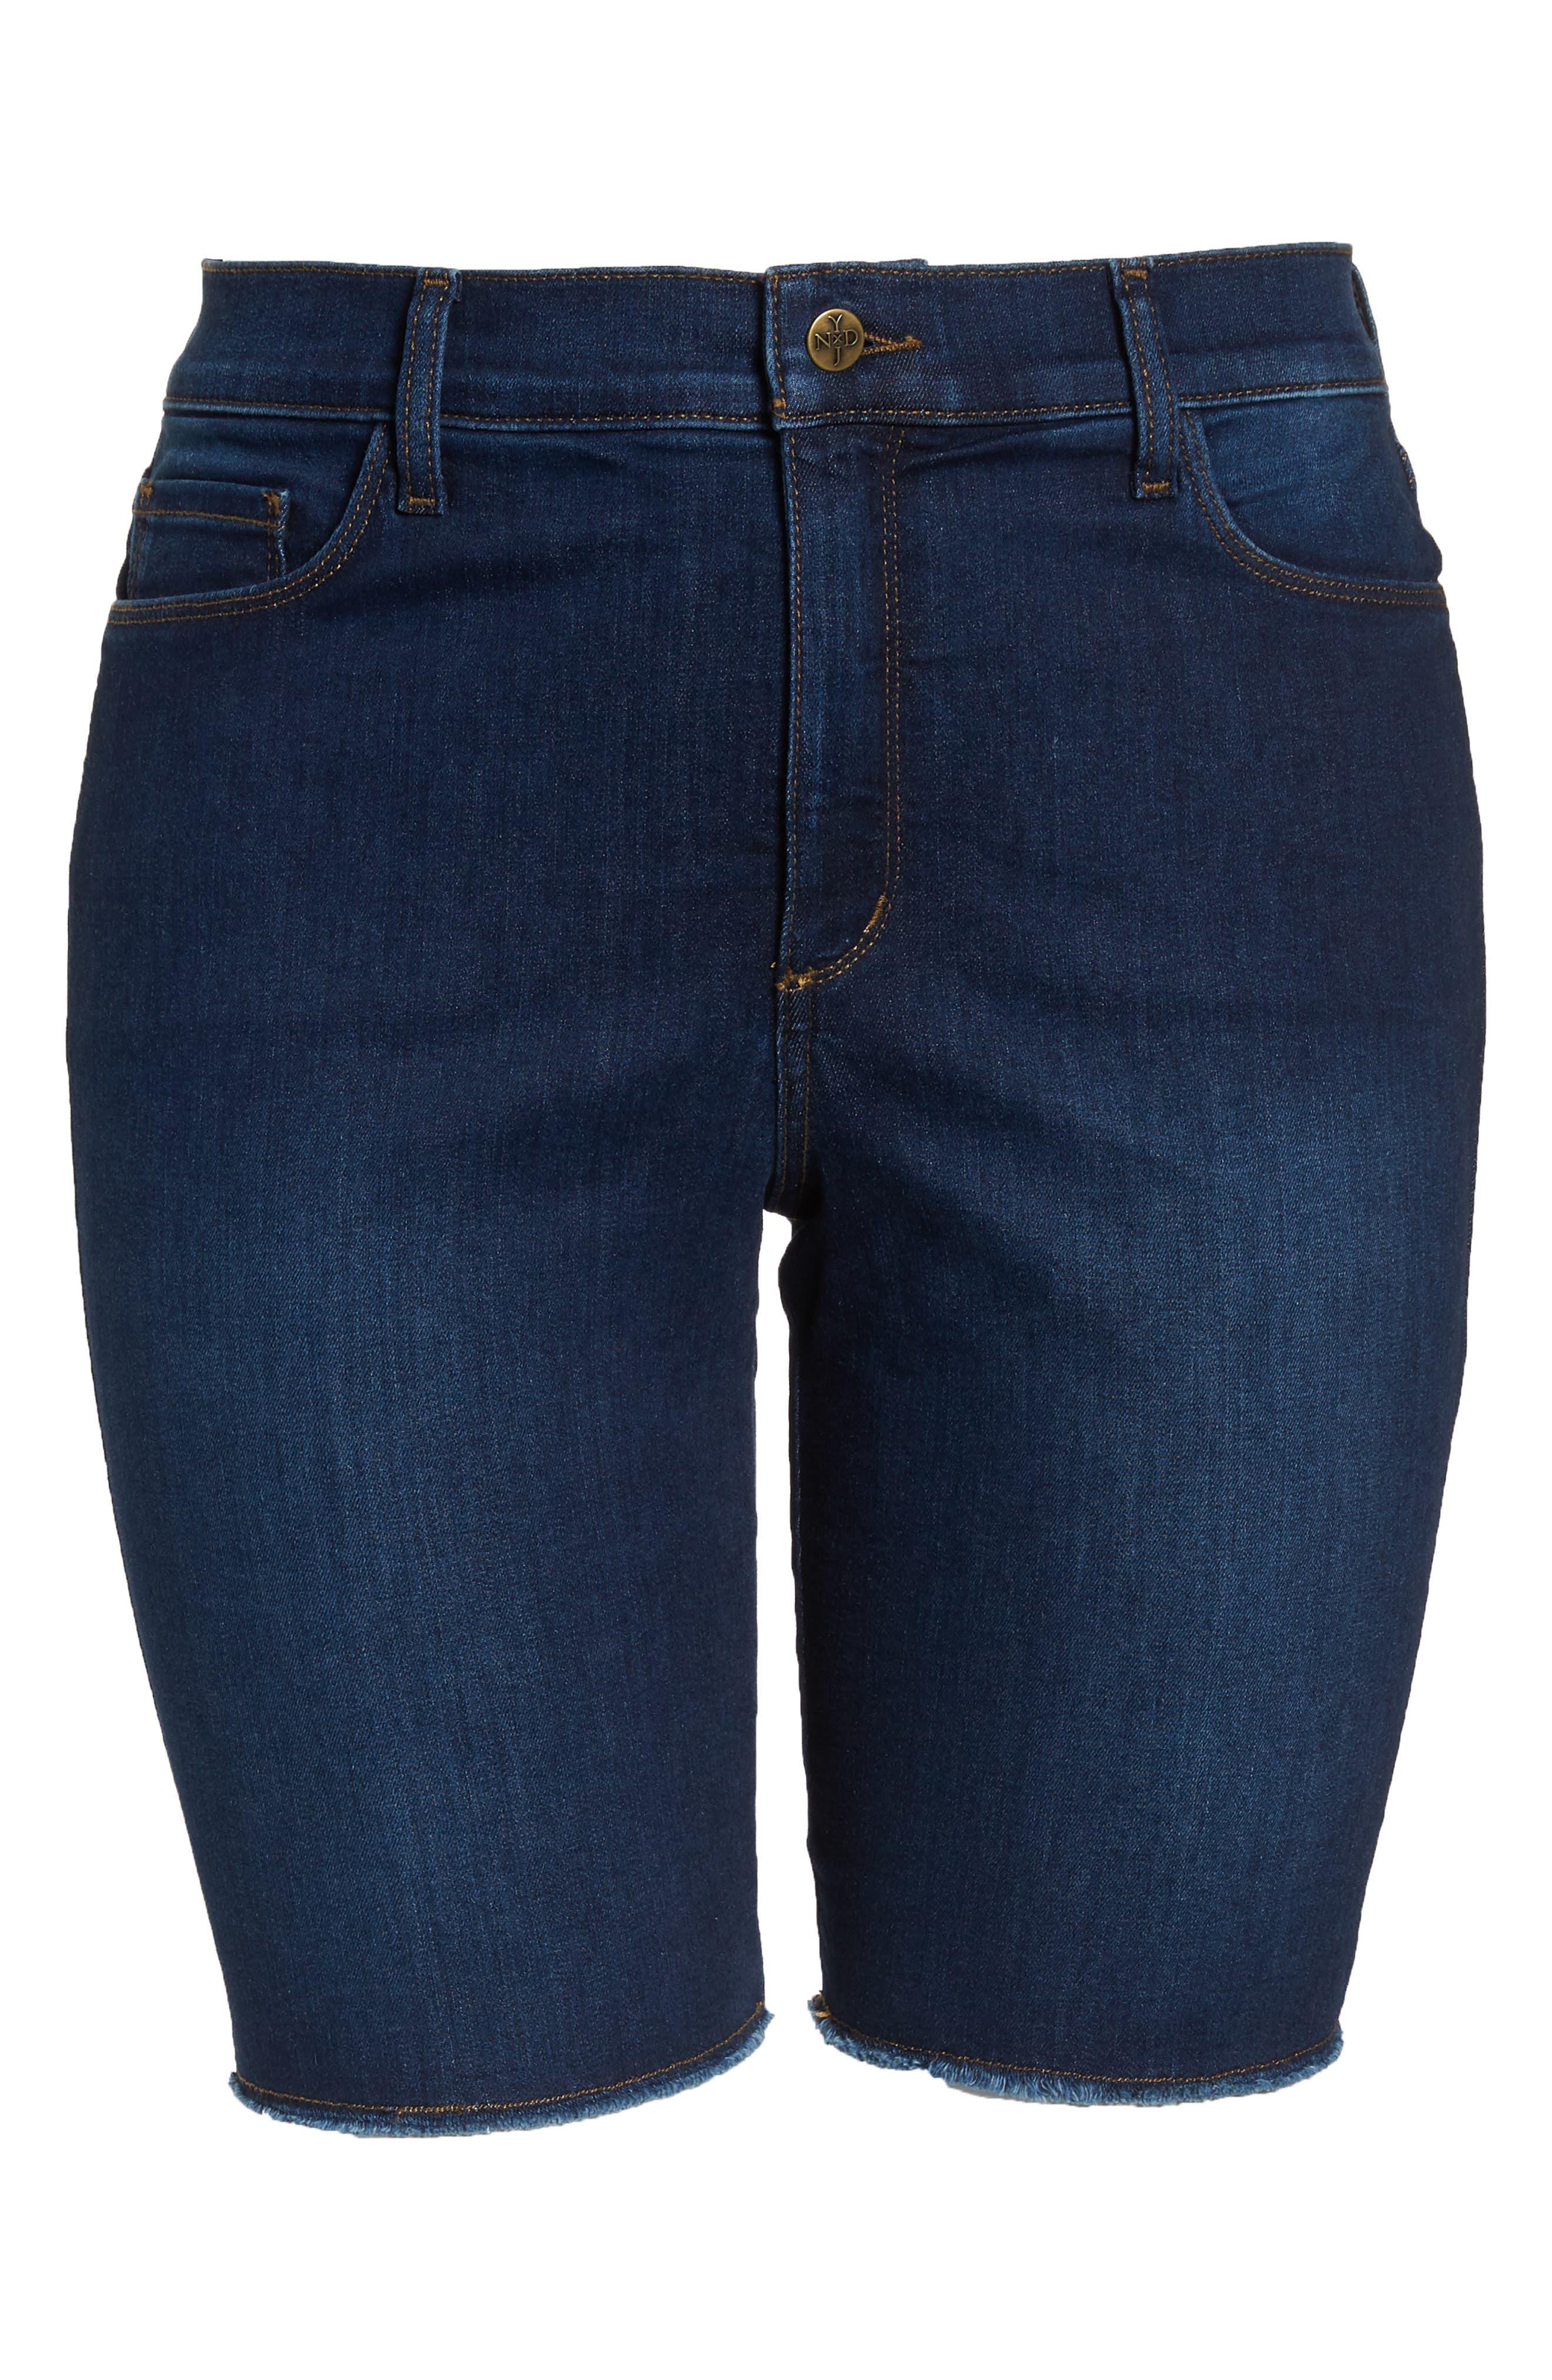 Briella Fray Hem Denim Bermuda Shorts,                             Alternate thumbnail 10, color,